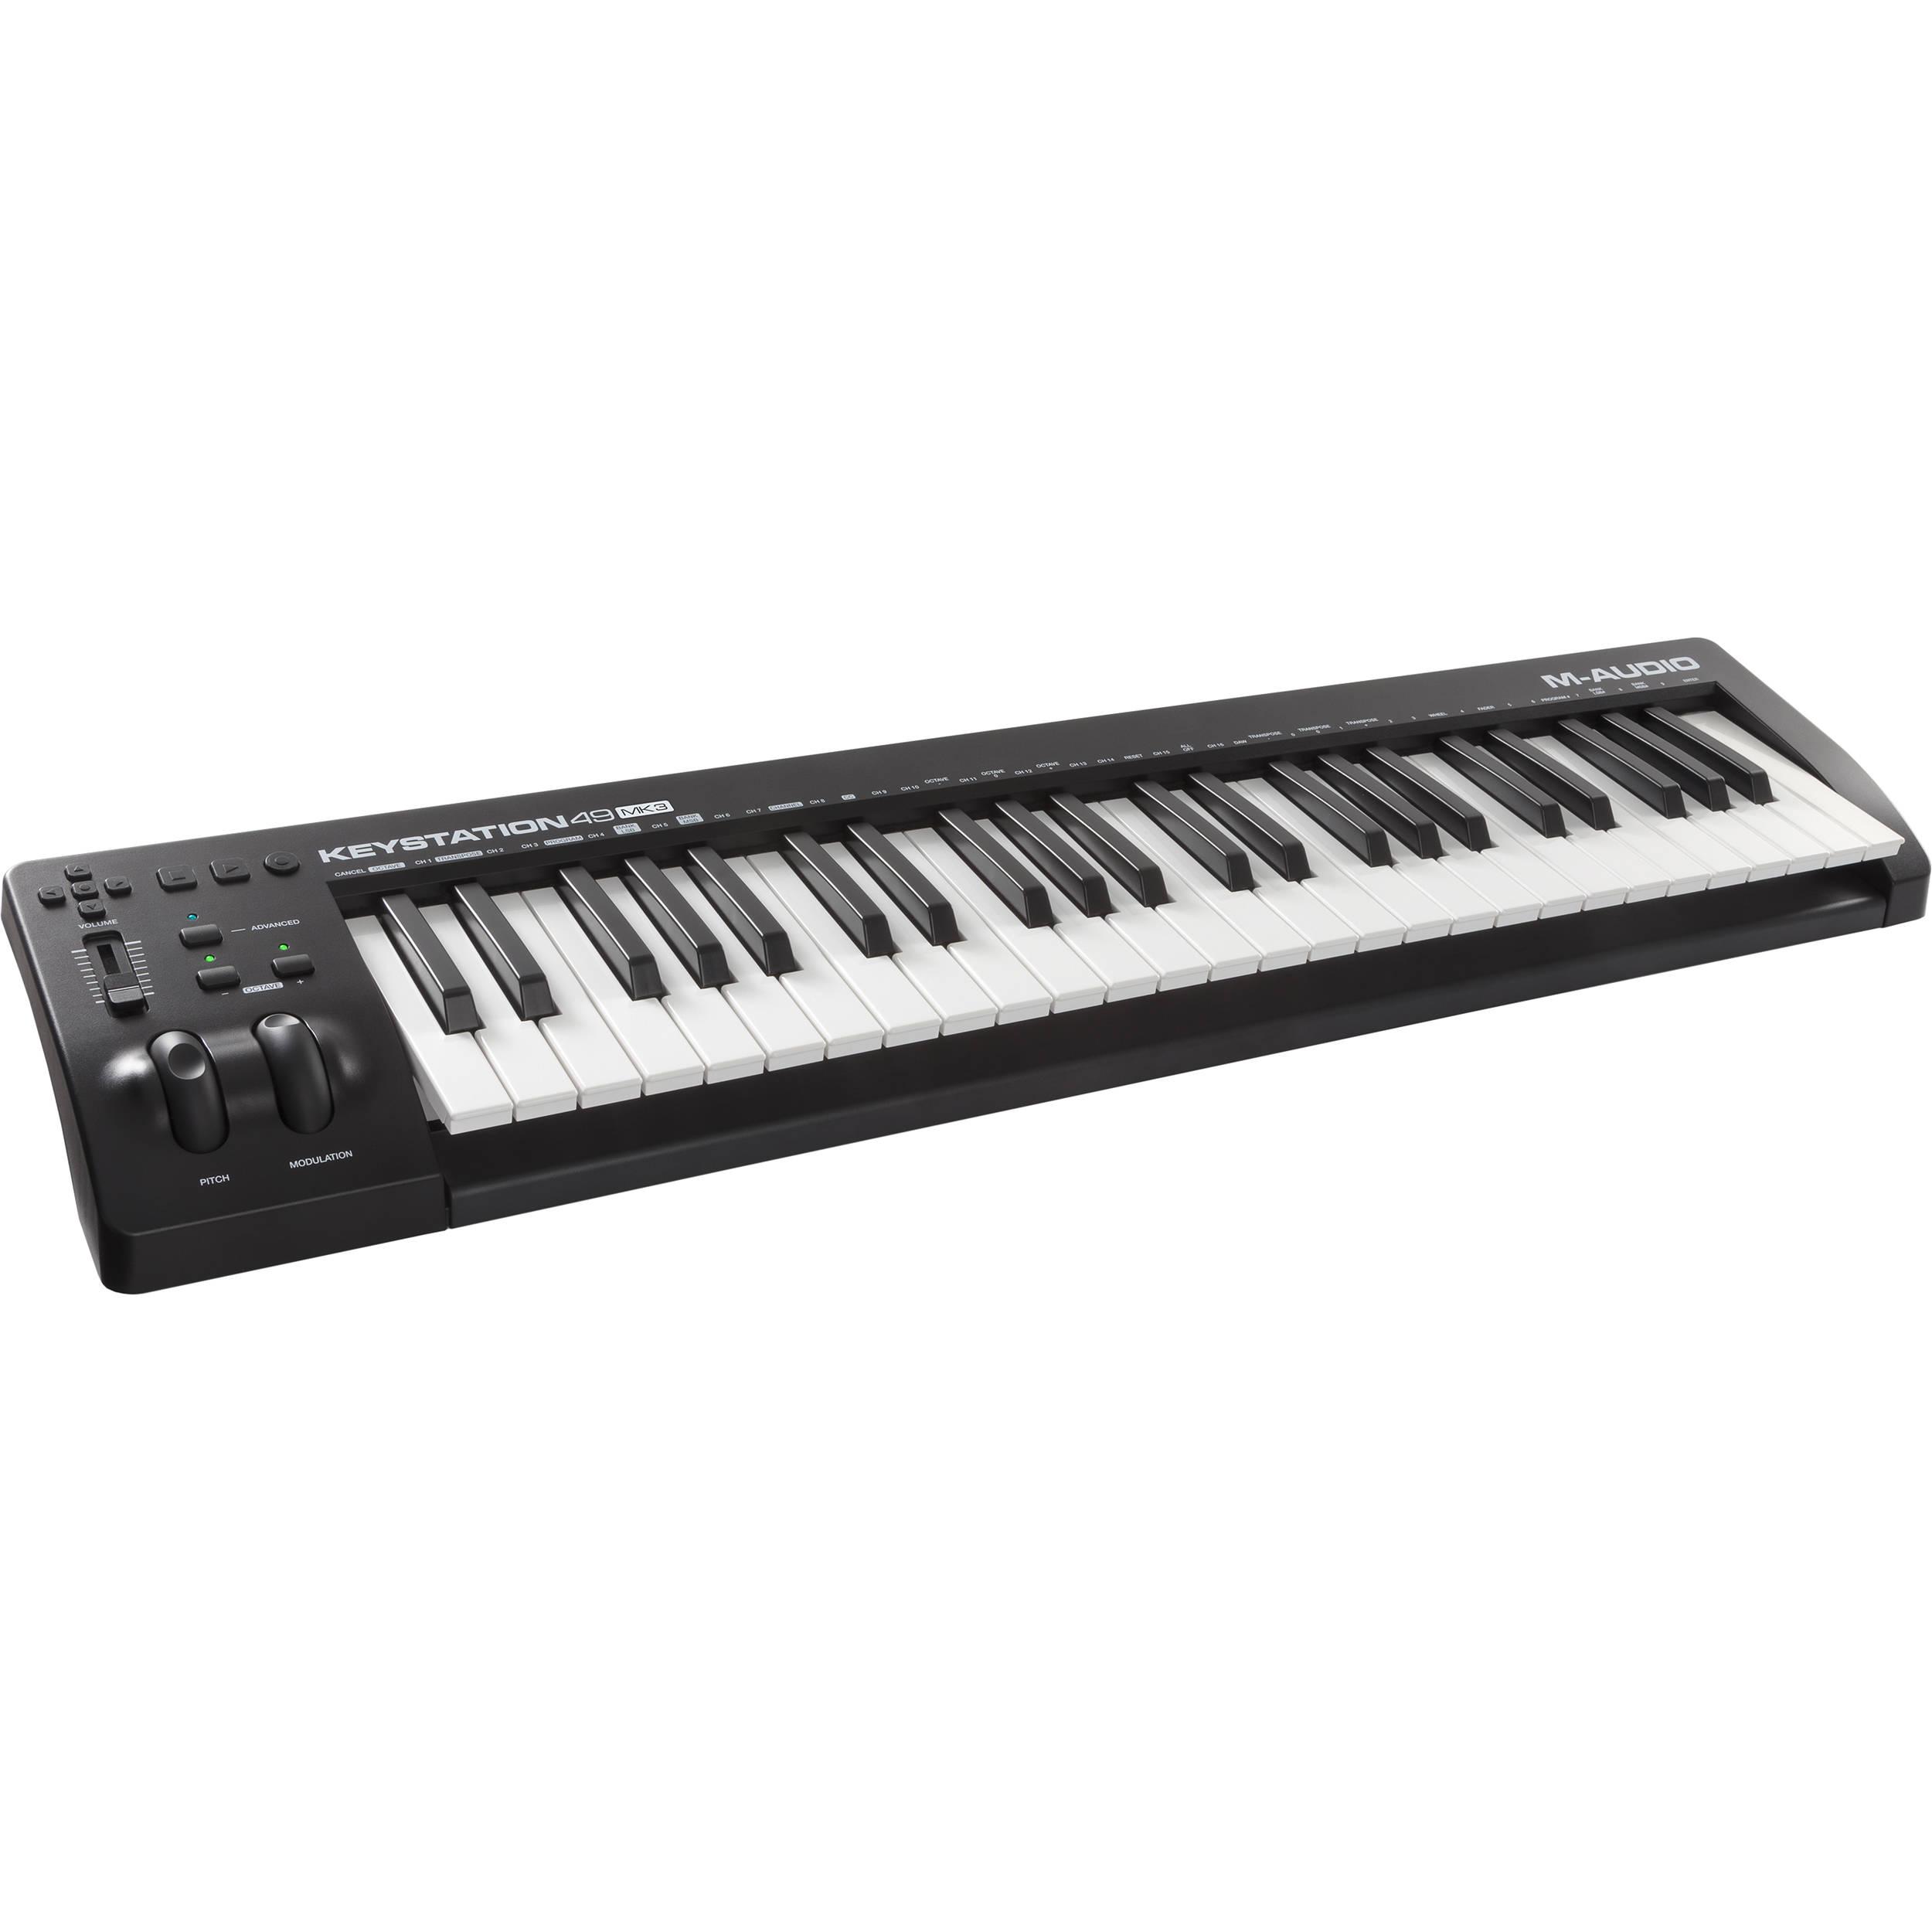 M-AUDIO KEYSTATION 49E MIDI DRIVERS WINDOWS 7 (2019)